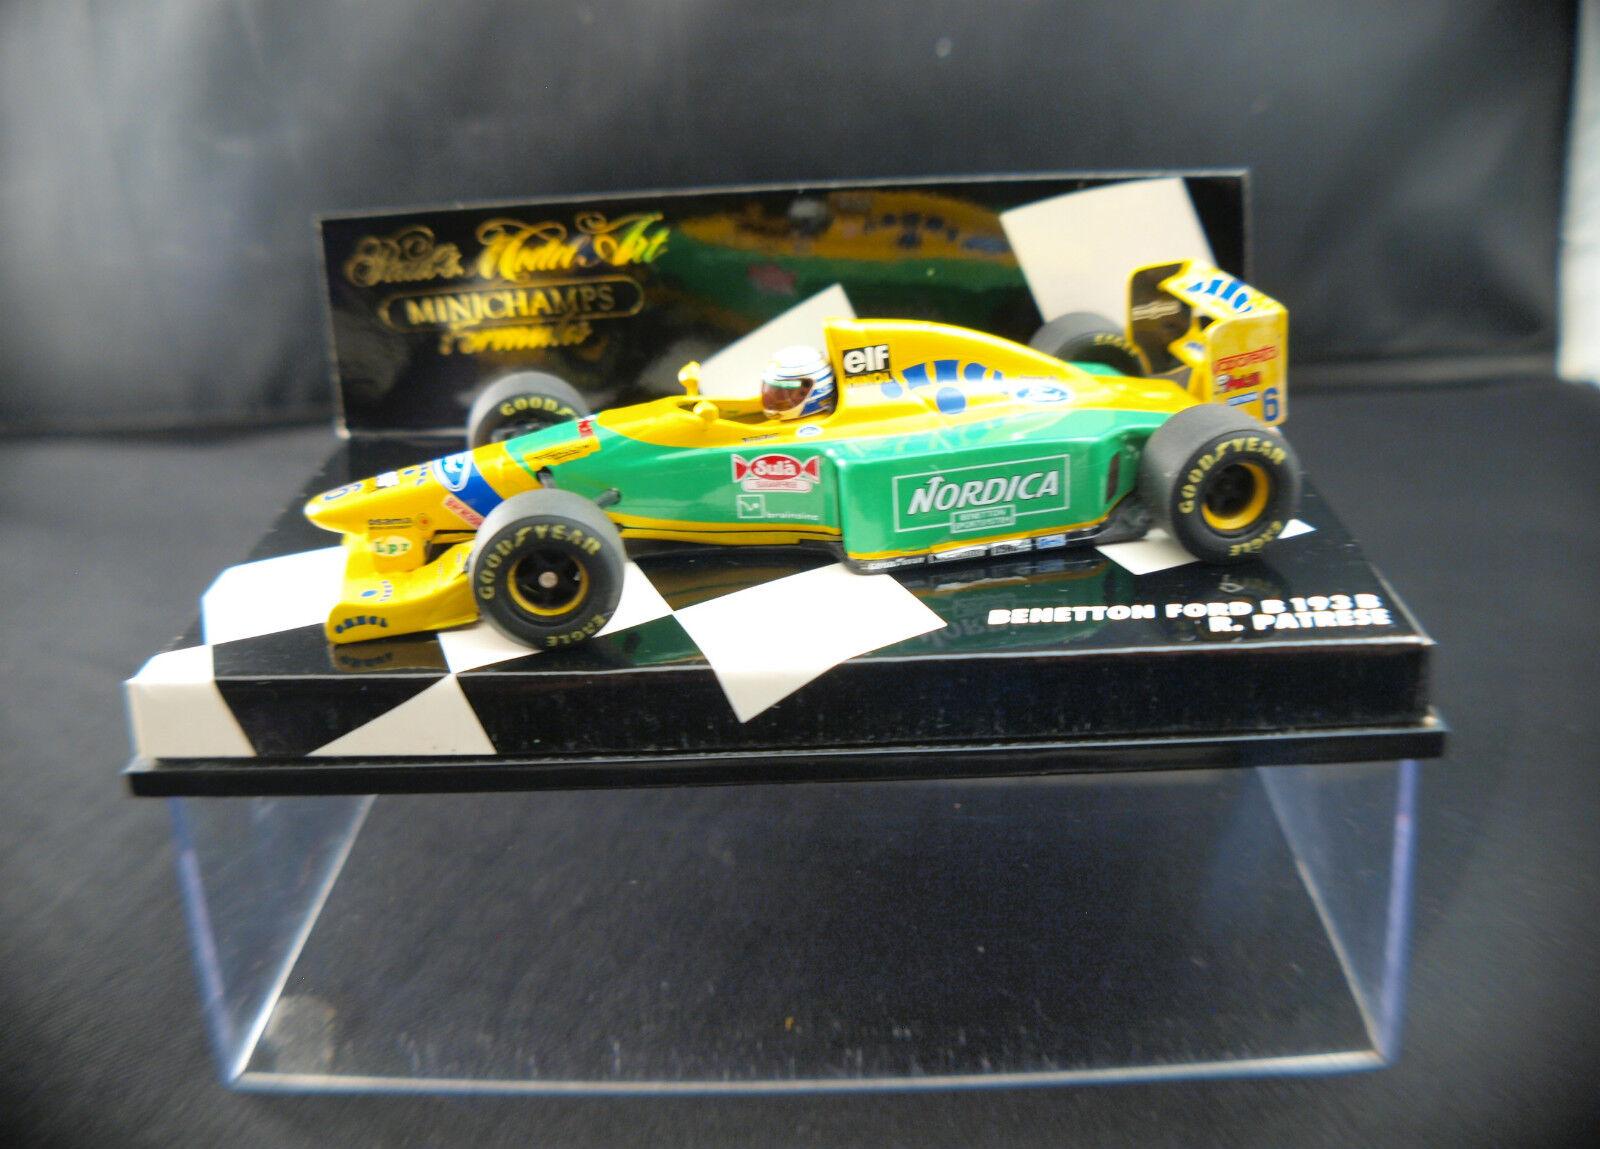 Minichamps ◊F1  Benetton Ford B193 B R.Patrese Nordica ◊1 43  ◊ boxed   en boîte